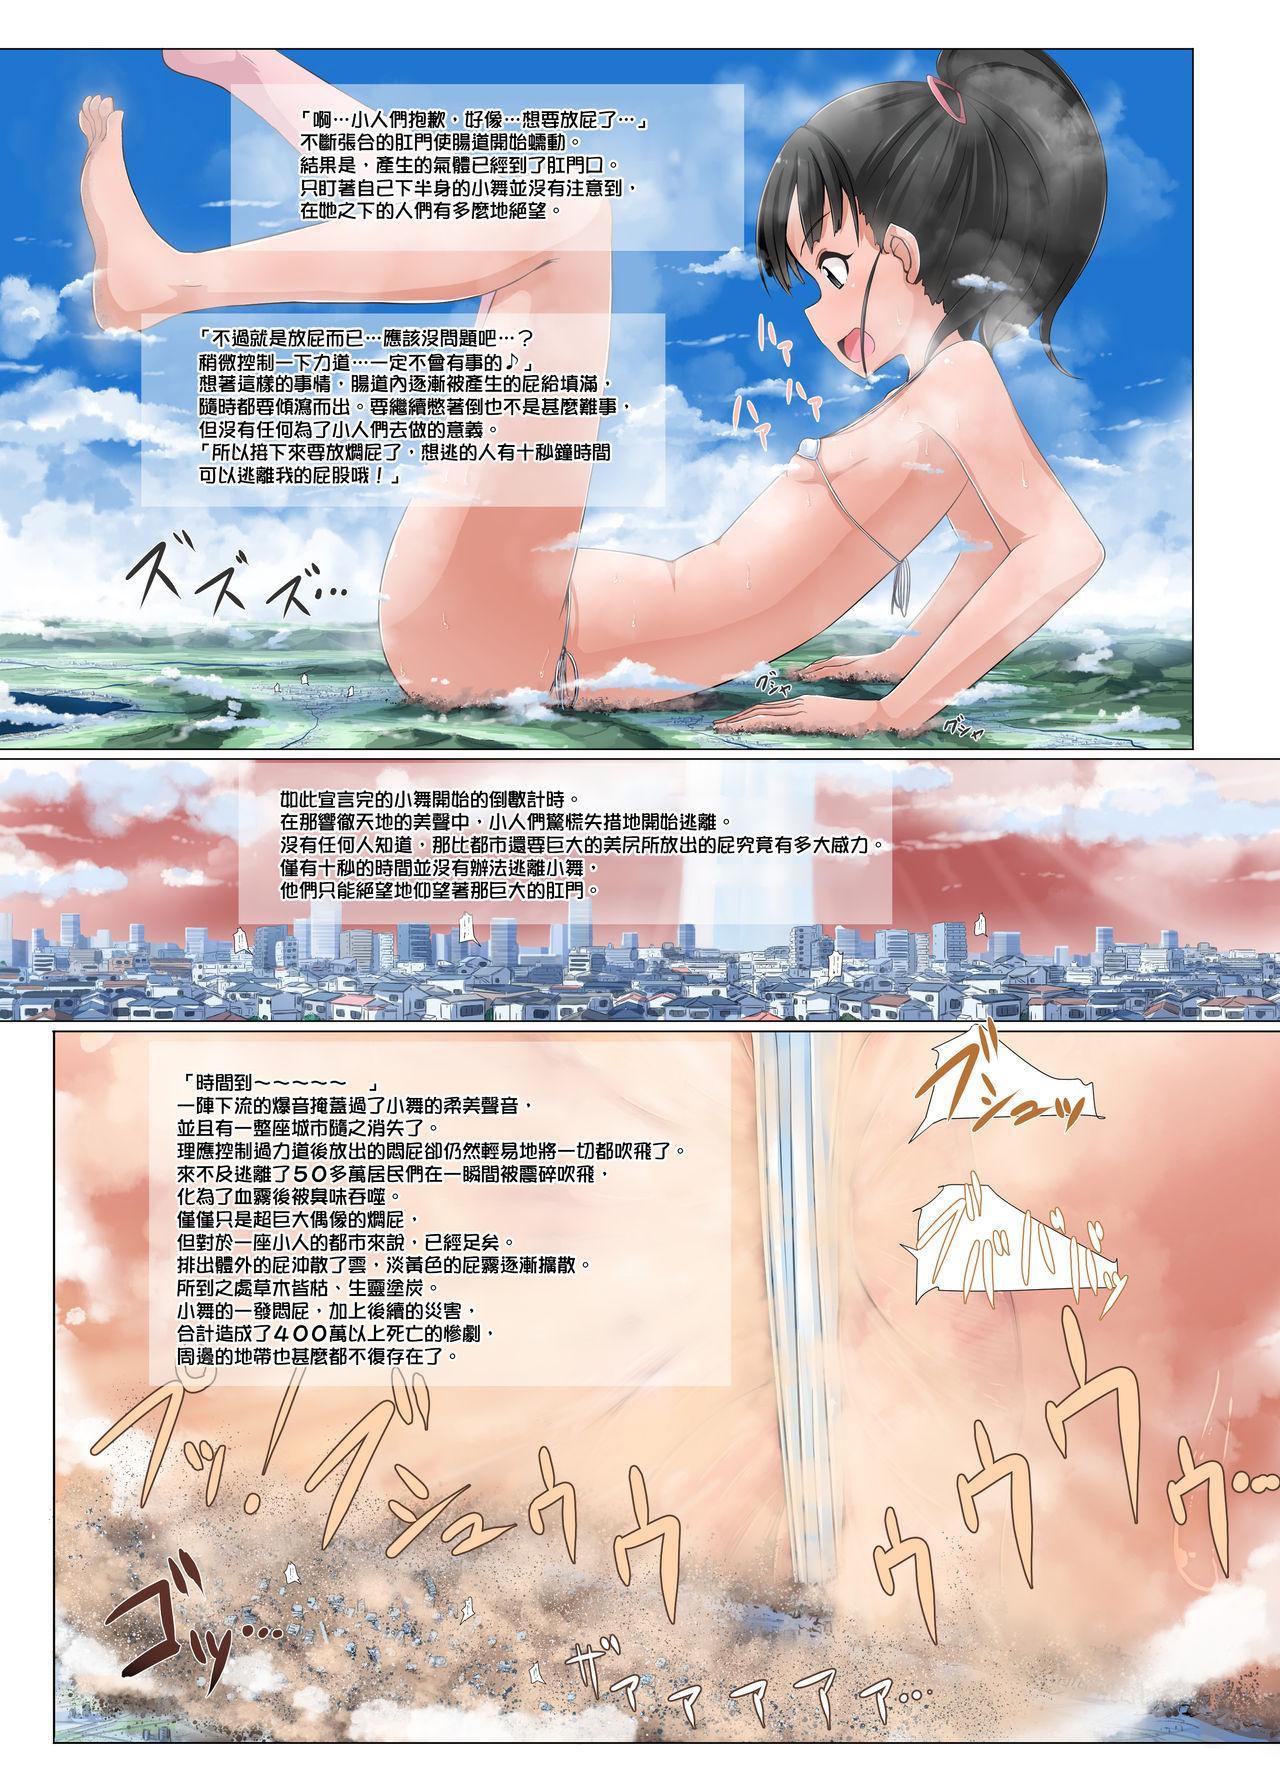 Chouoogata Idol | 超大型愛抖露 6